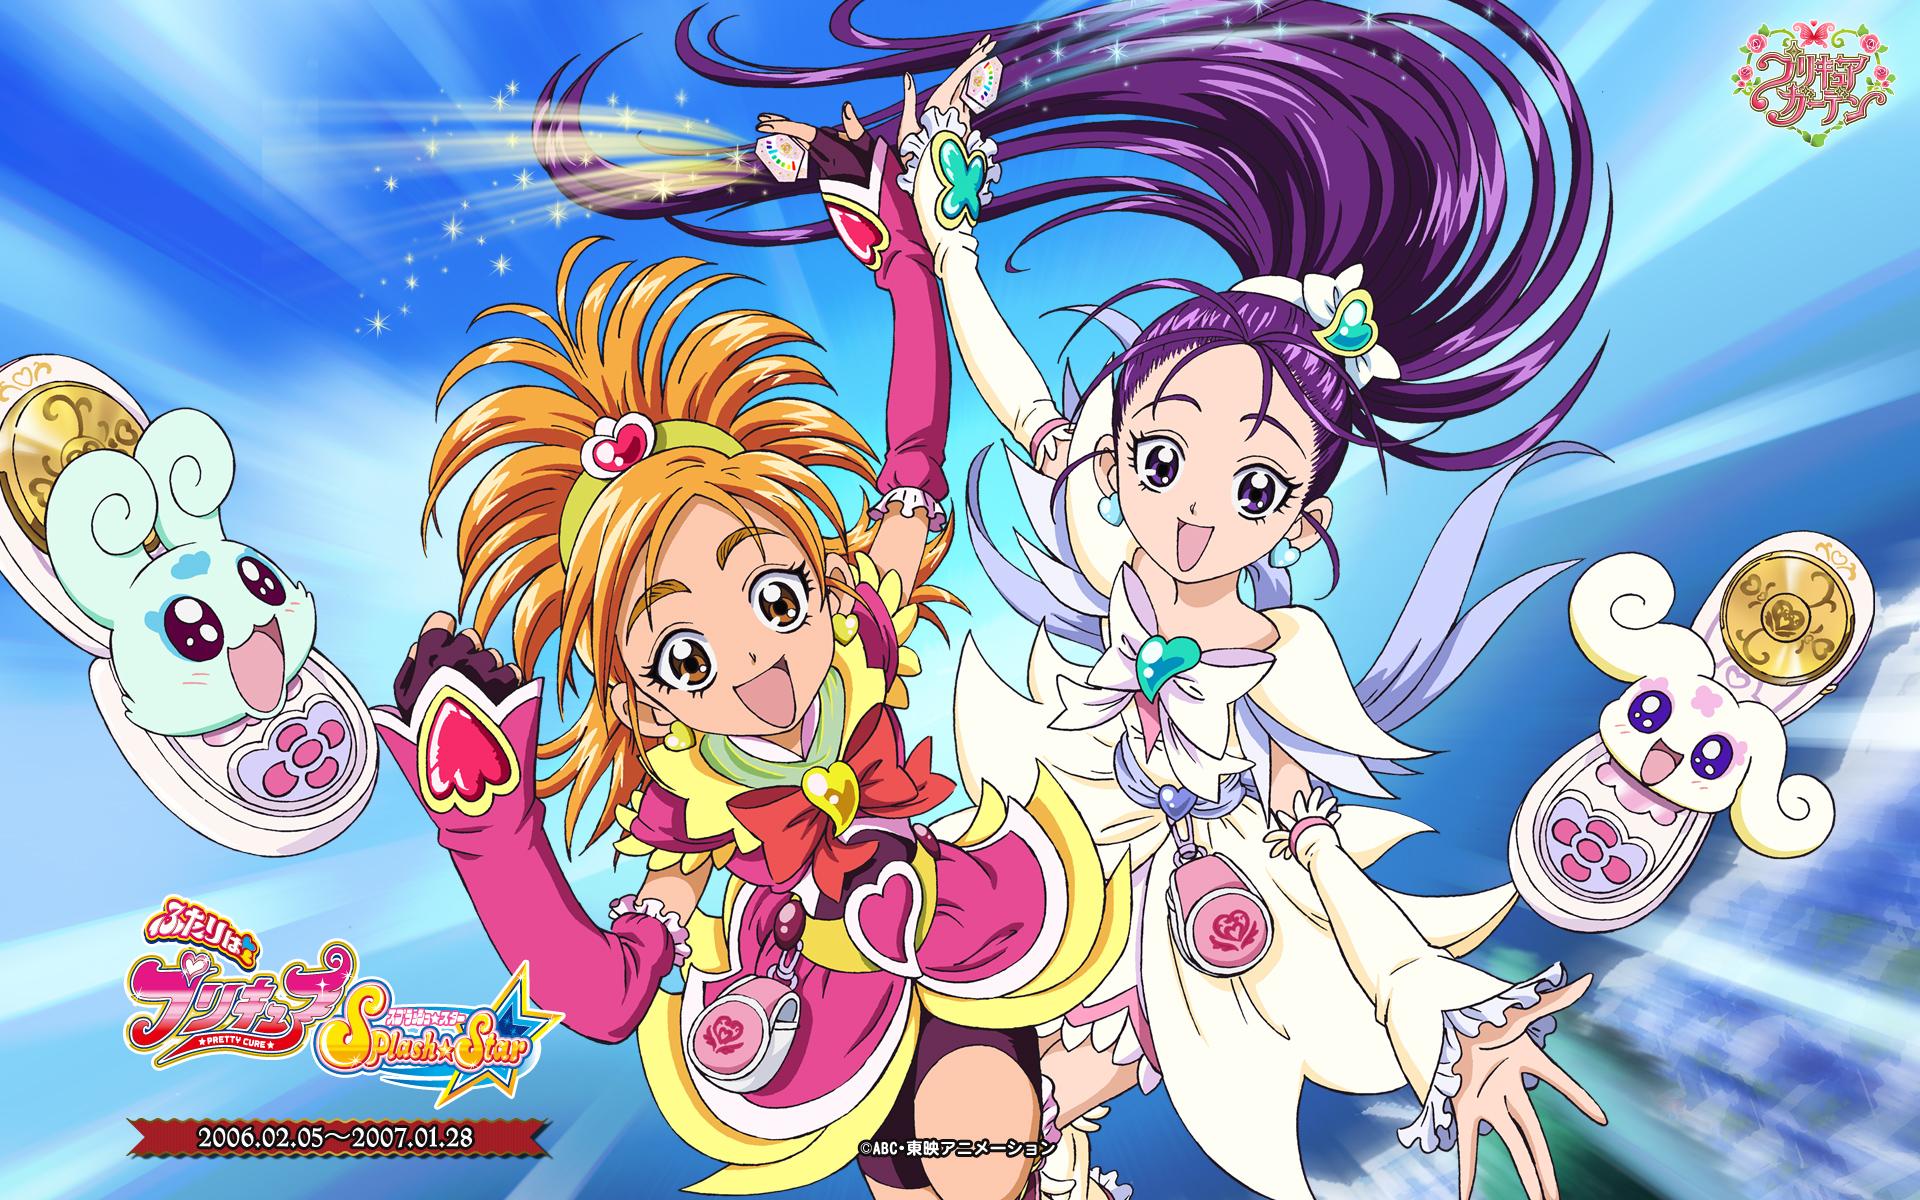 Mishou Mai Wallpaper Zerochan Anime Image Board